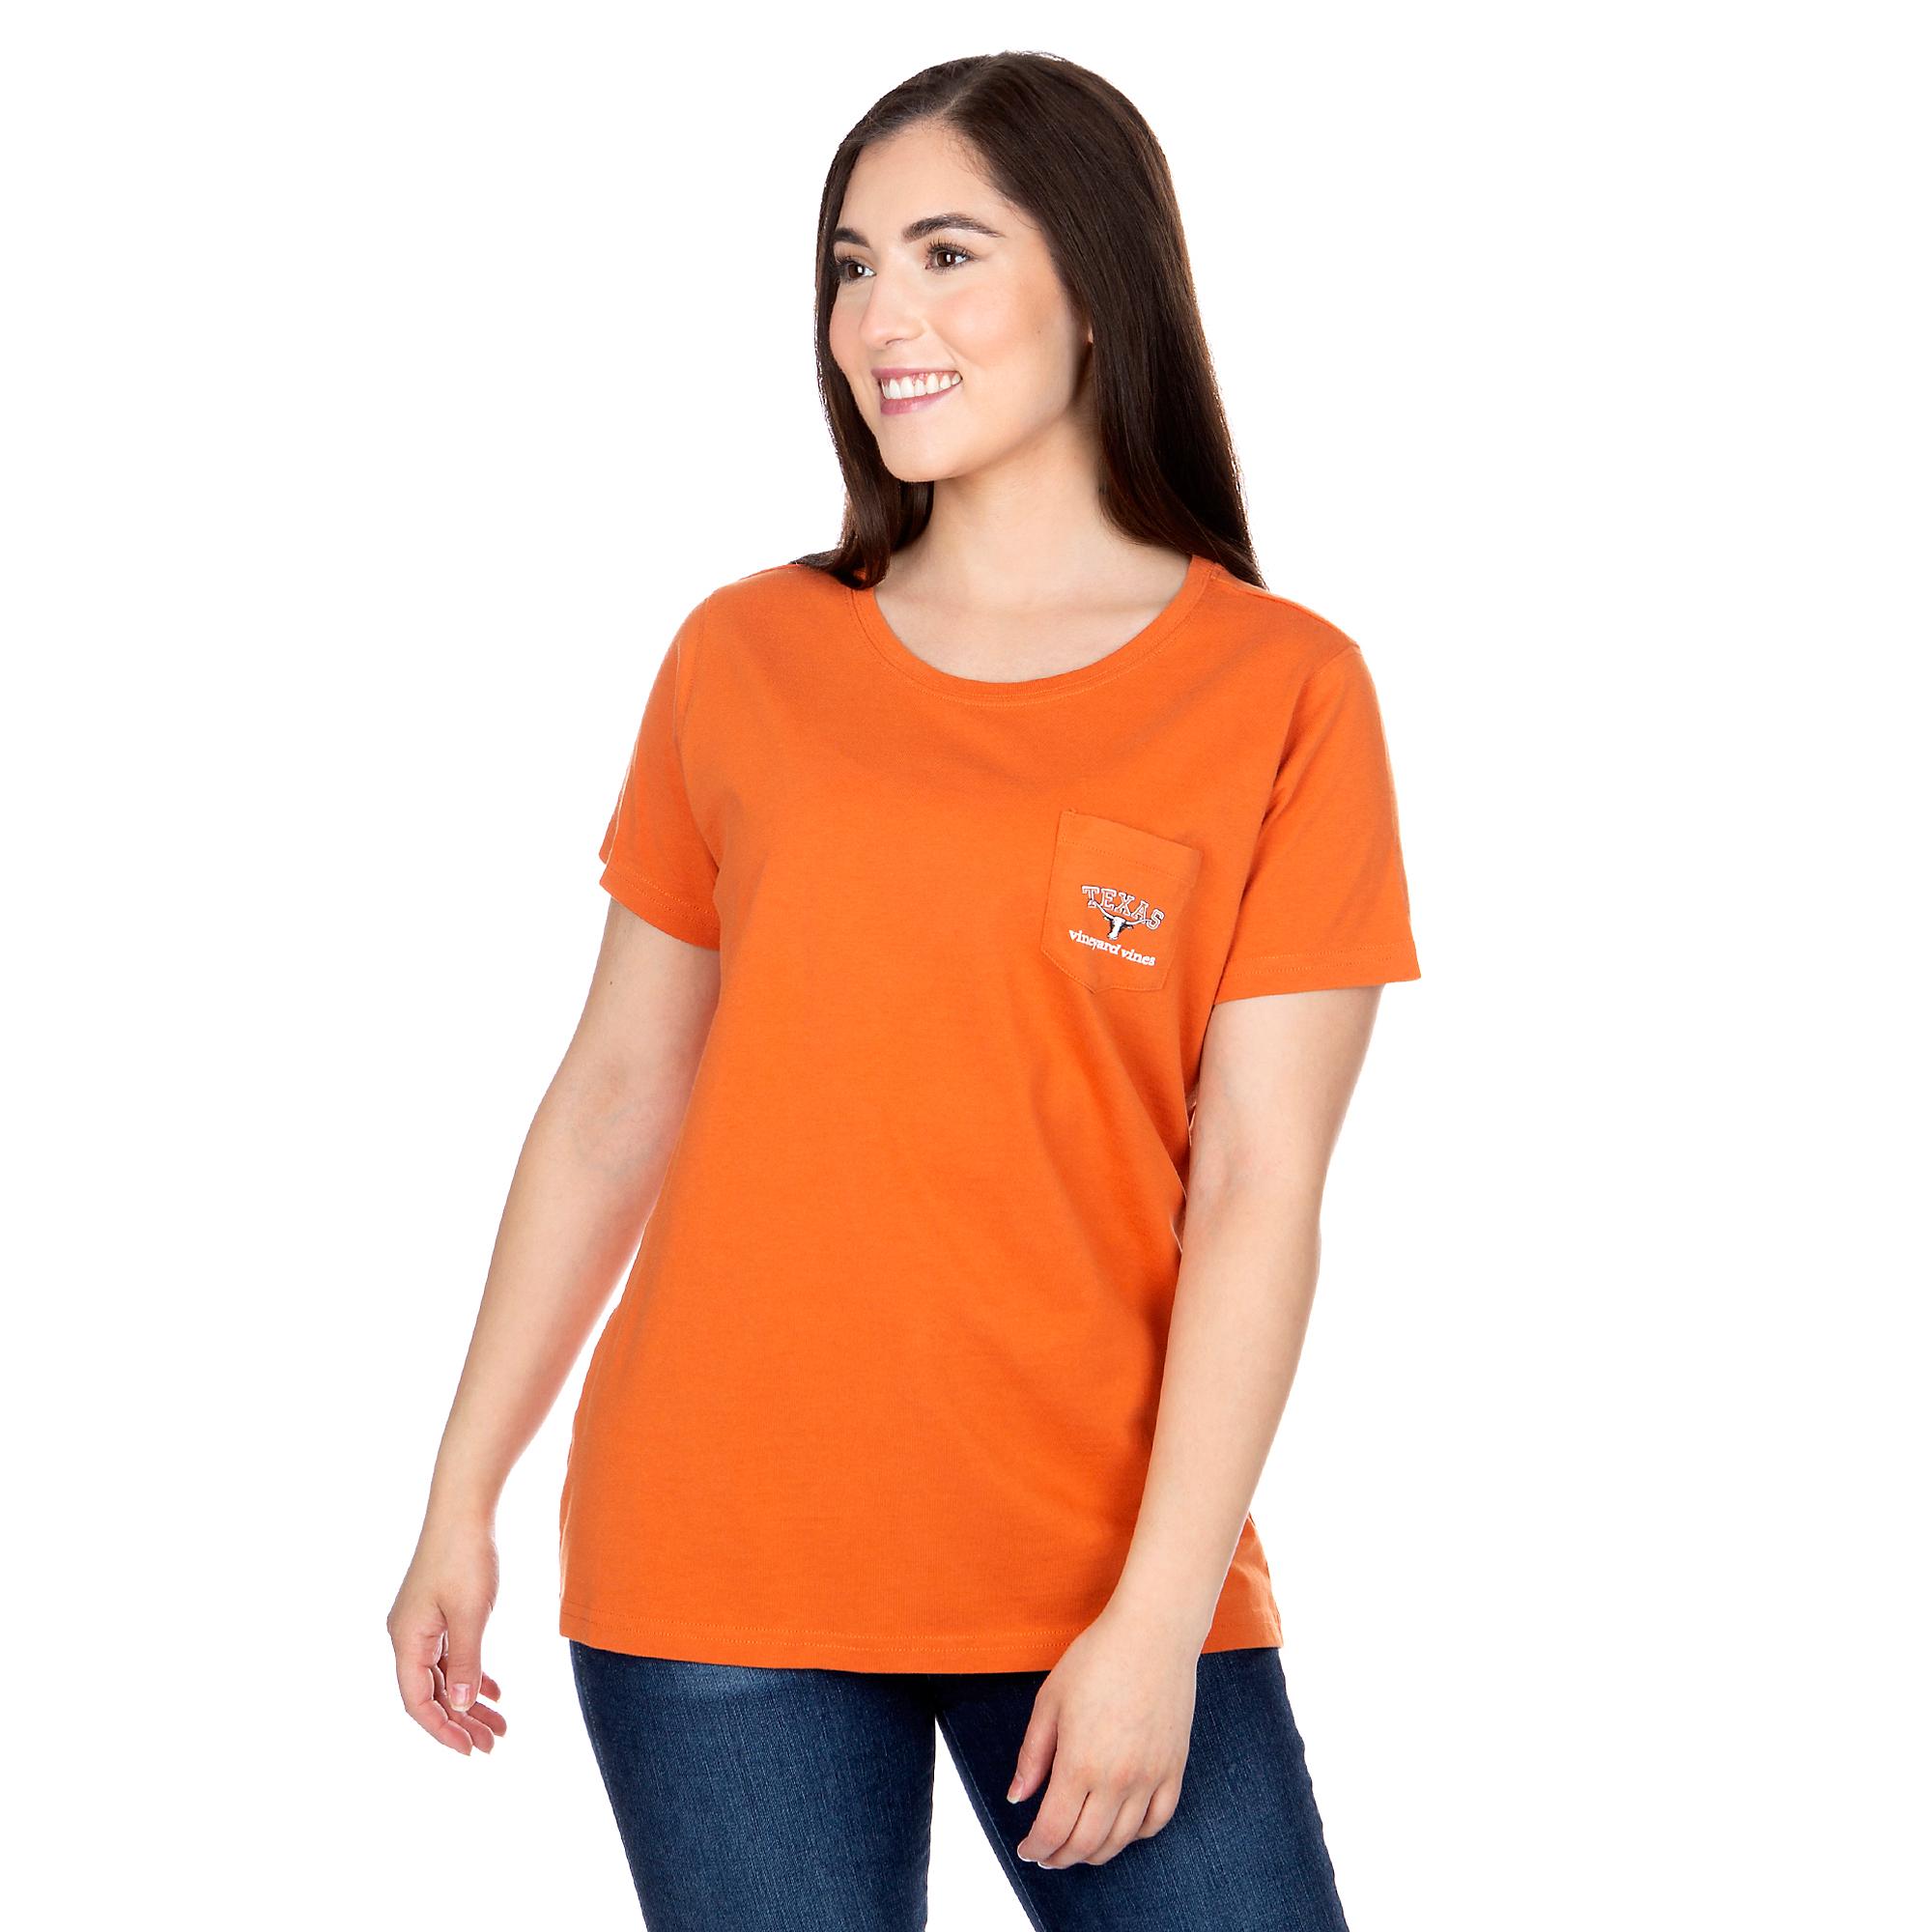 Texas Longhorns Vineyard Vines Womens State Short Sleeve T-Shirt